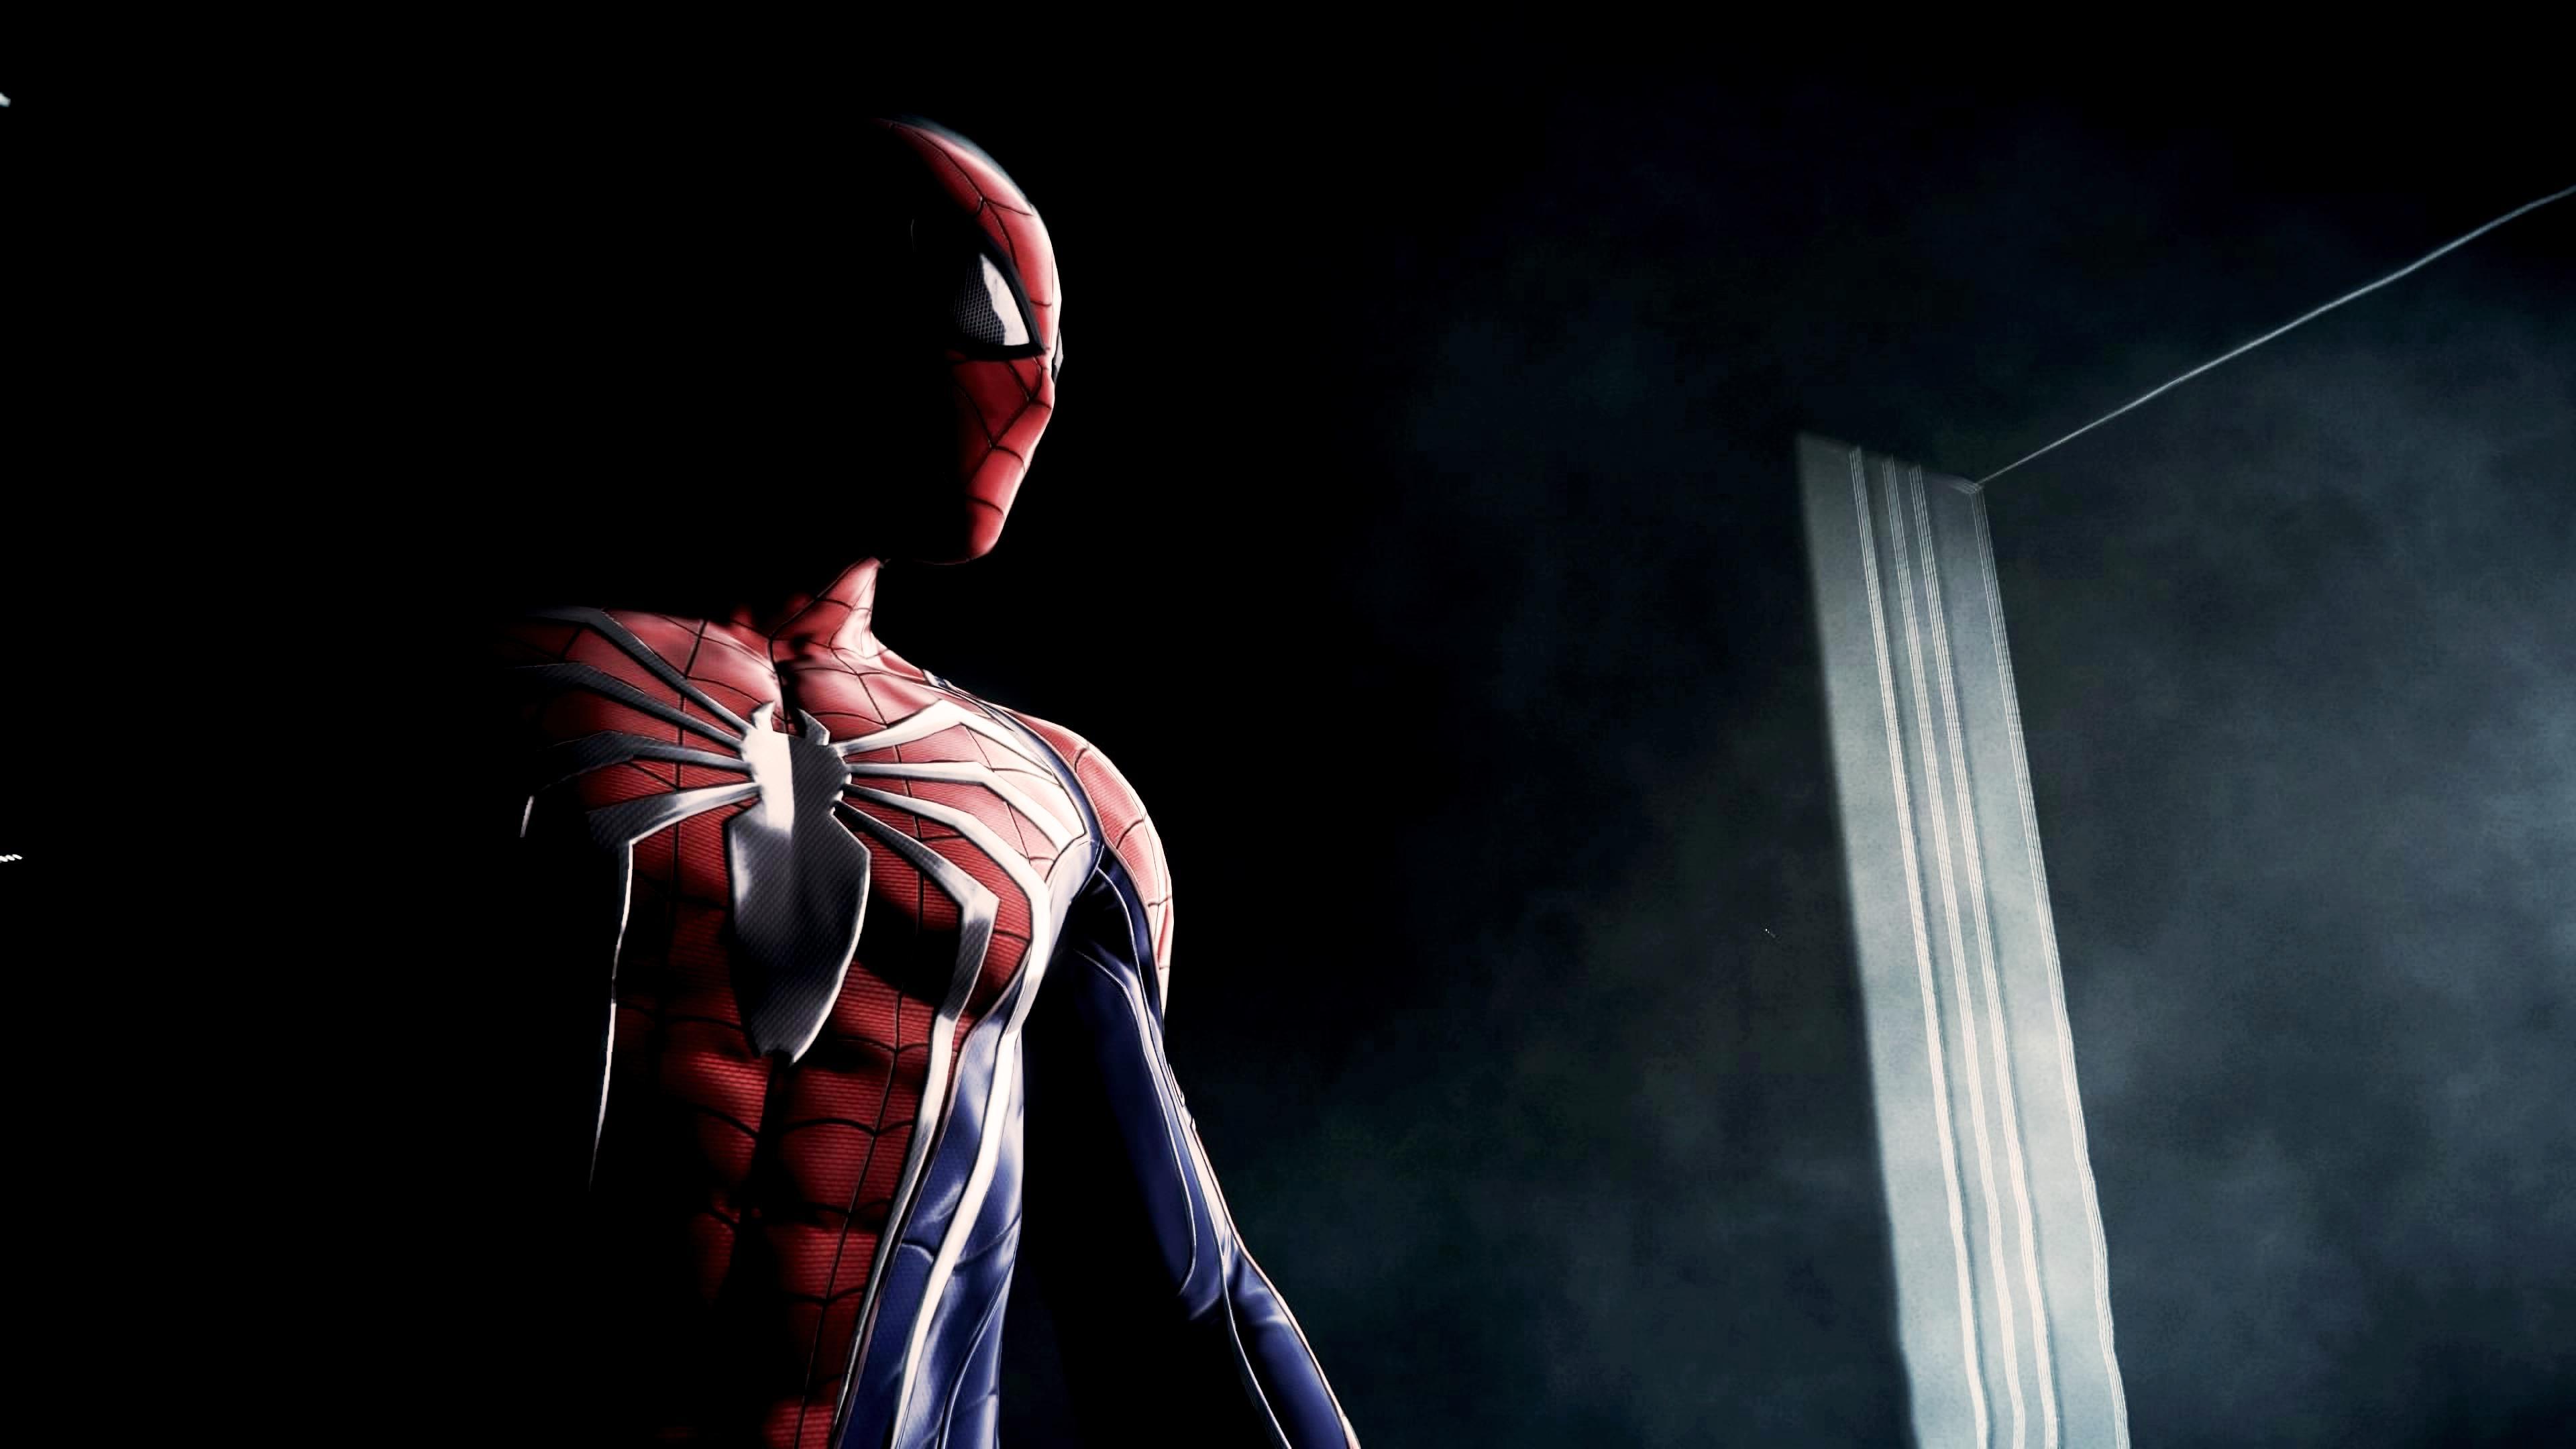 ps4 spiderman game art, hd superheroes, 4k wallpapers, images